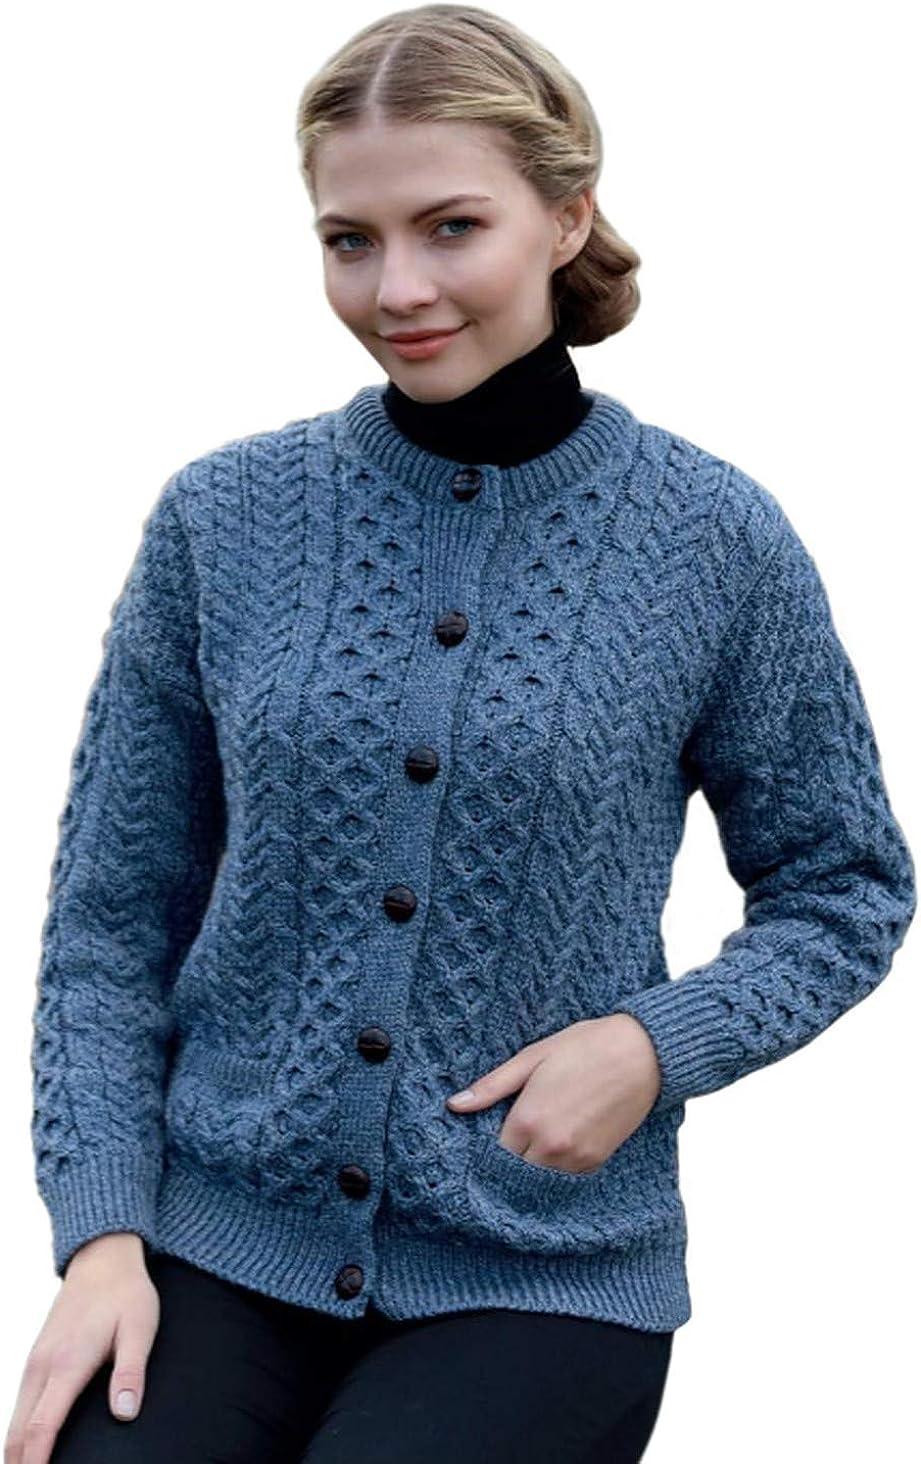 Irish Aran Cardigan Sweater for Women Made in Ireland Merino Wool Lumber Jacket